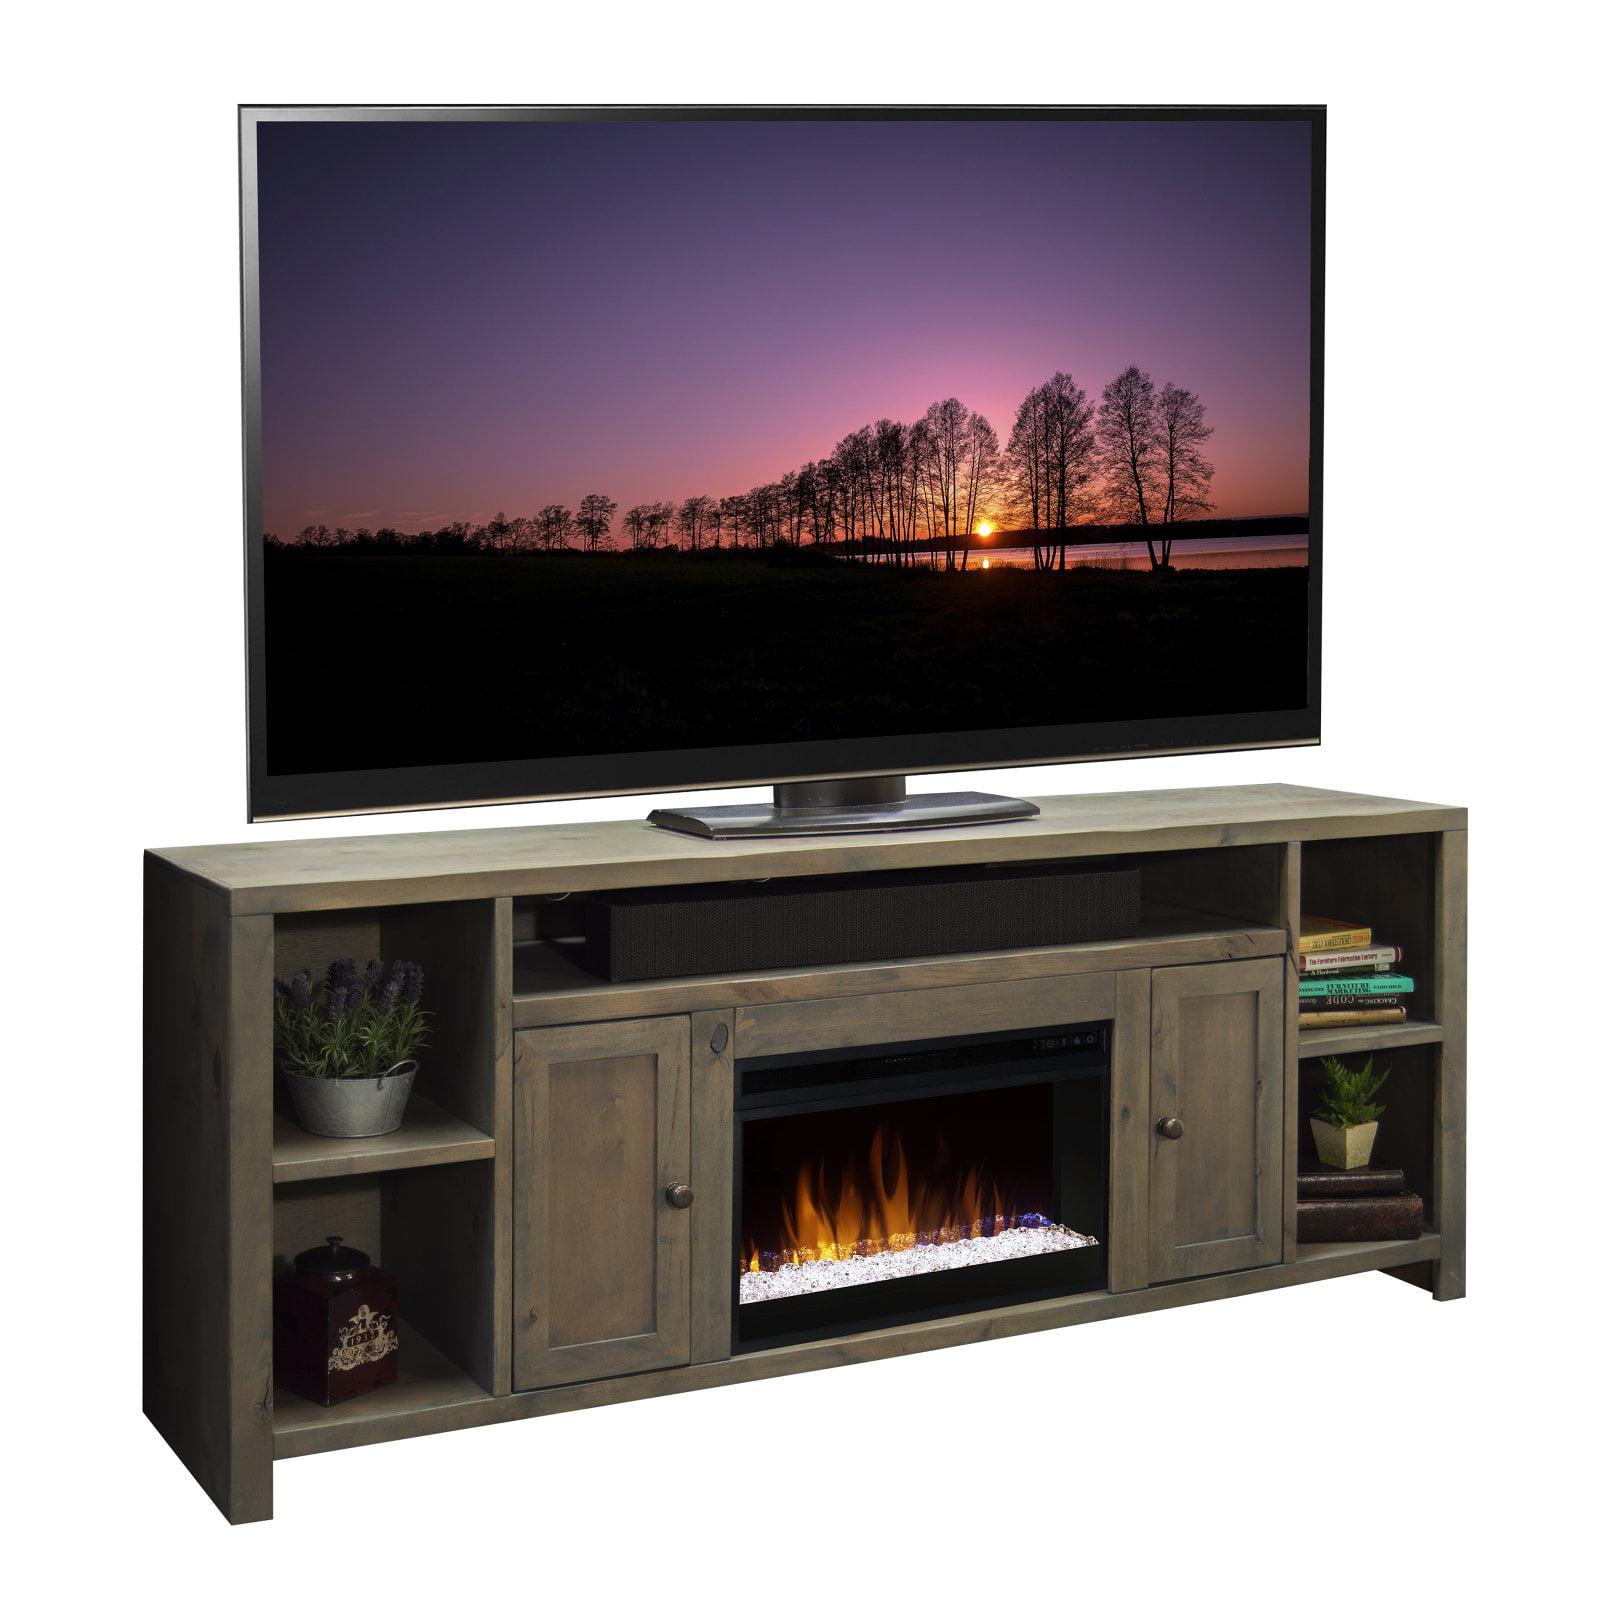 Legends Furniture Joshua Creek Electric Media Fireplace